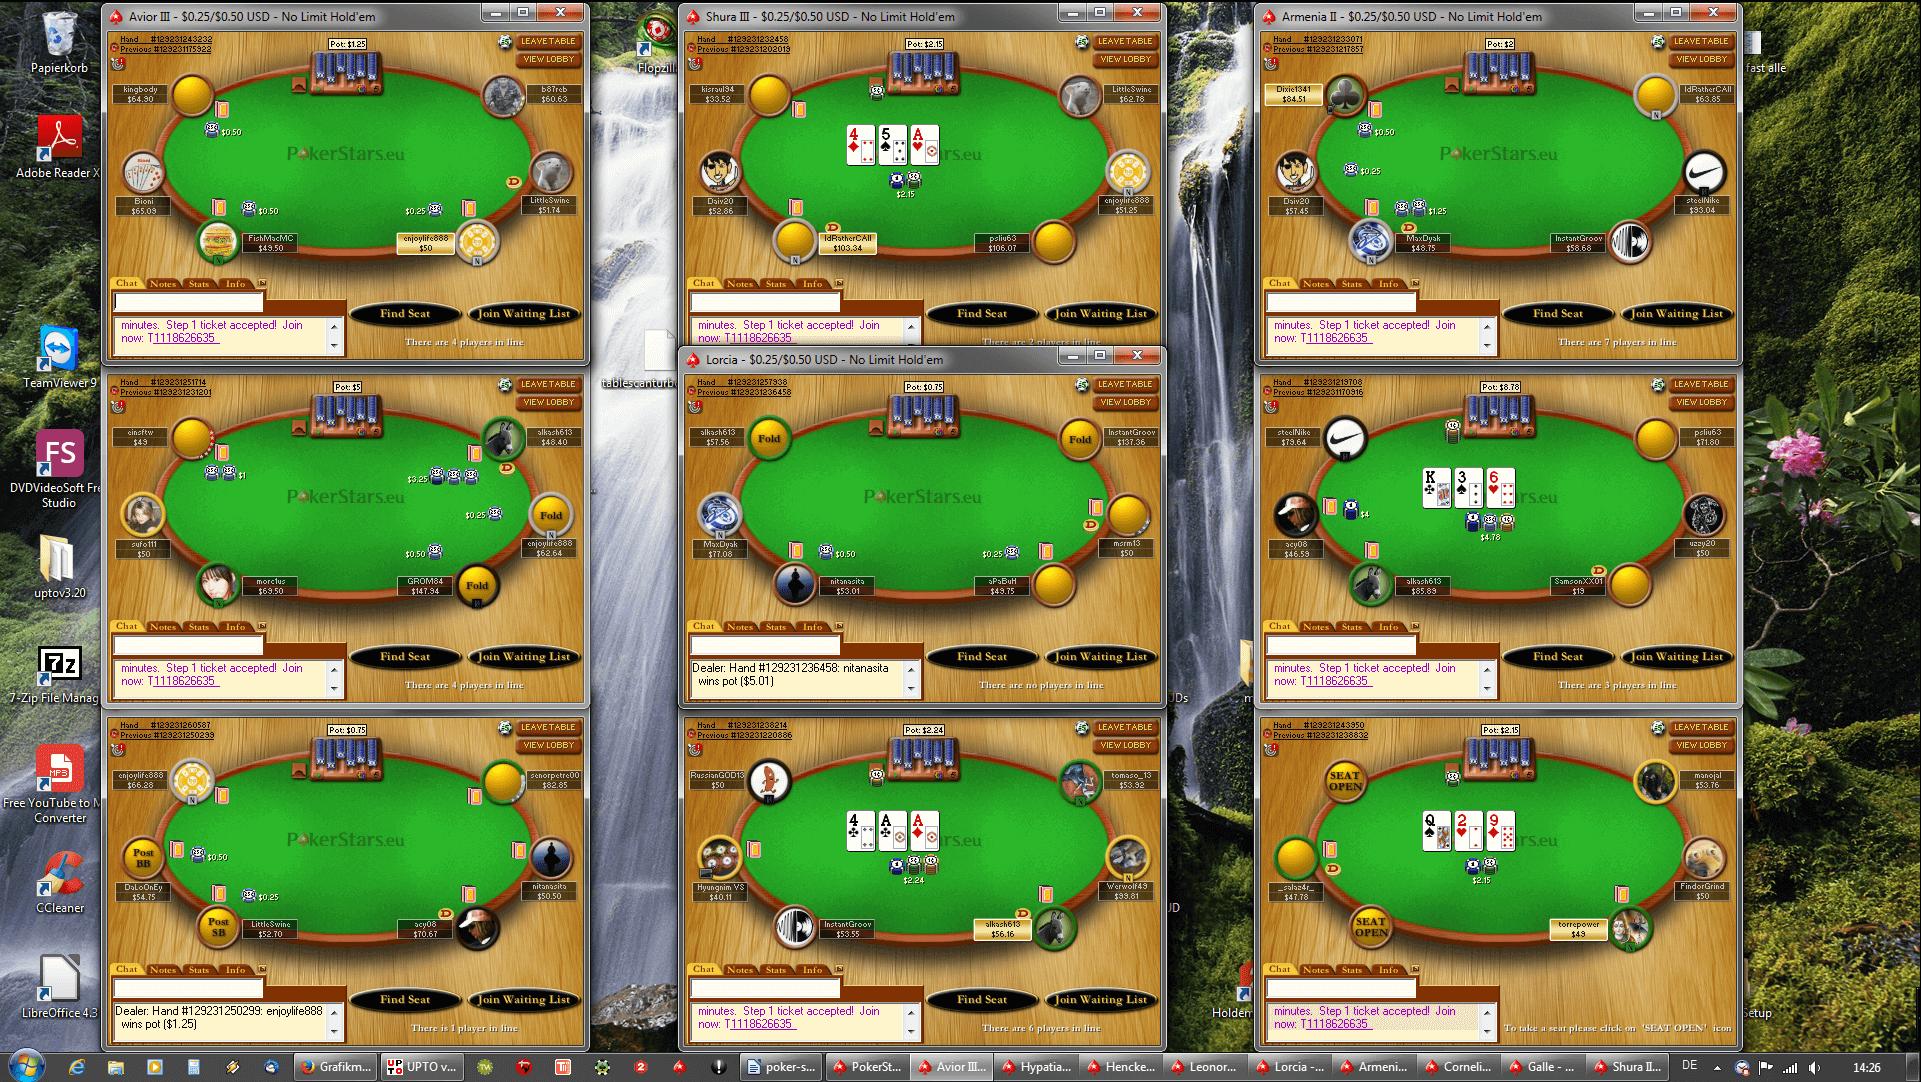 Tischanordnung Poker - FullHD(3x3)